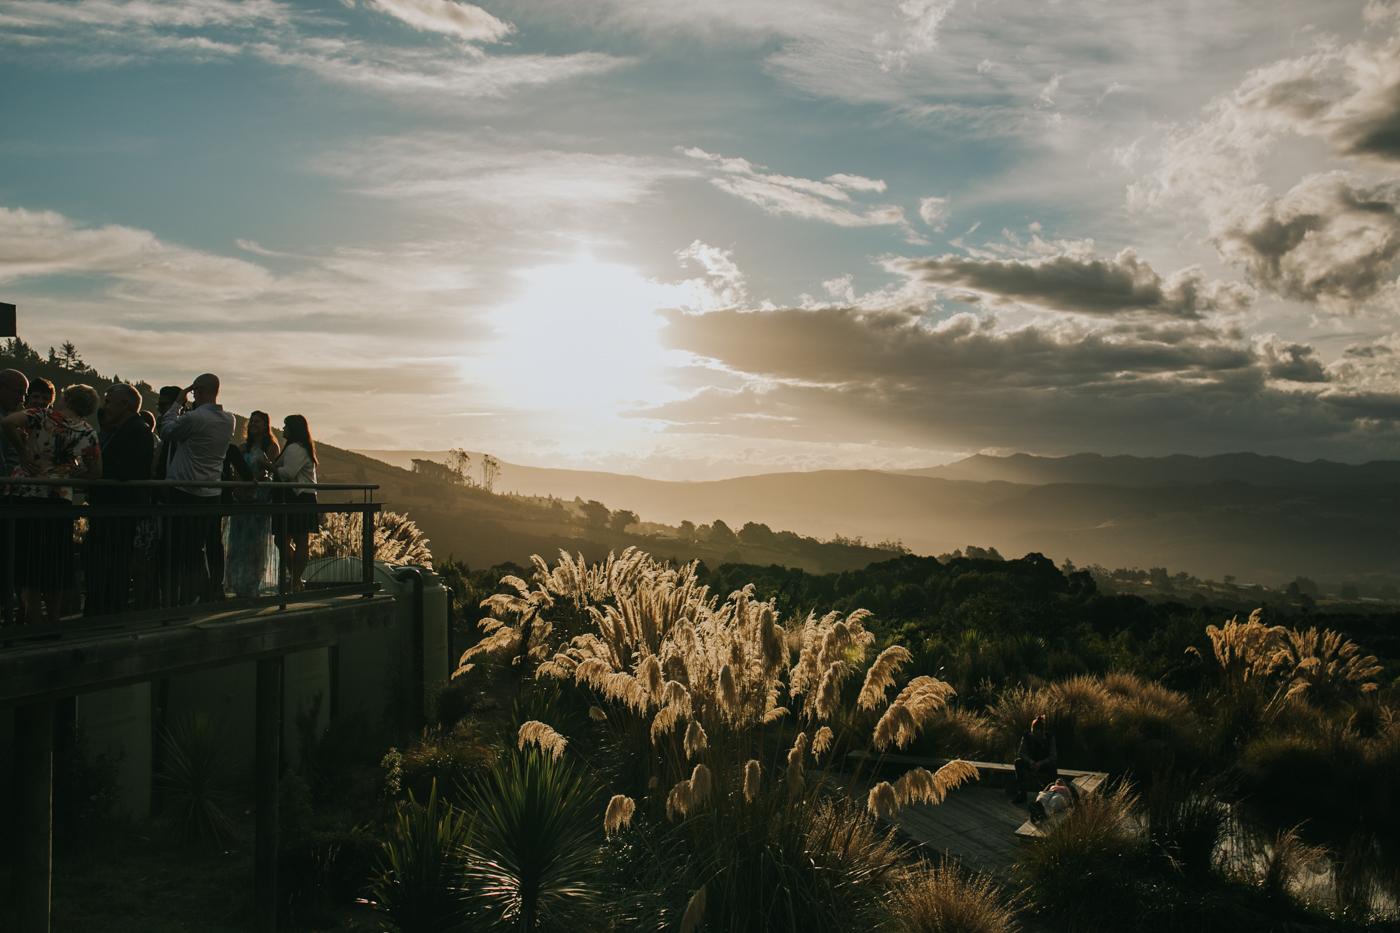 Ariana & Tim - Dunedin, New Zealand Wedding - Destination Wedding - Samantha Heather Photography-228.jpg